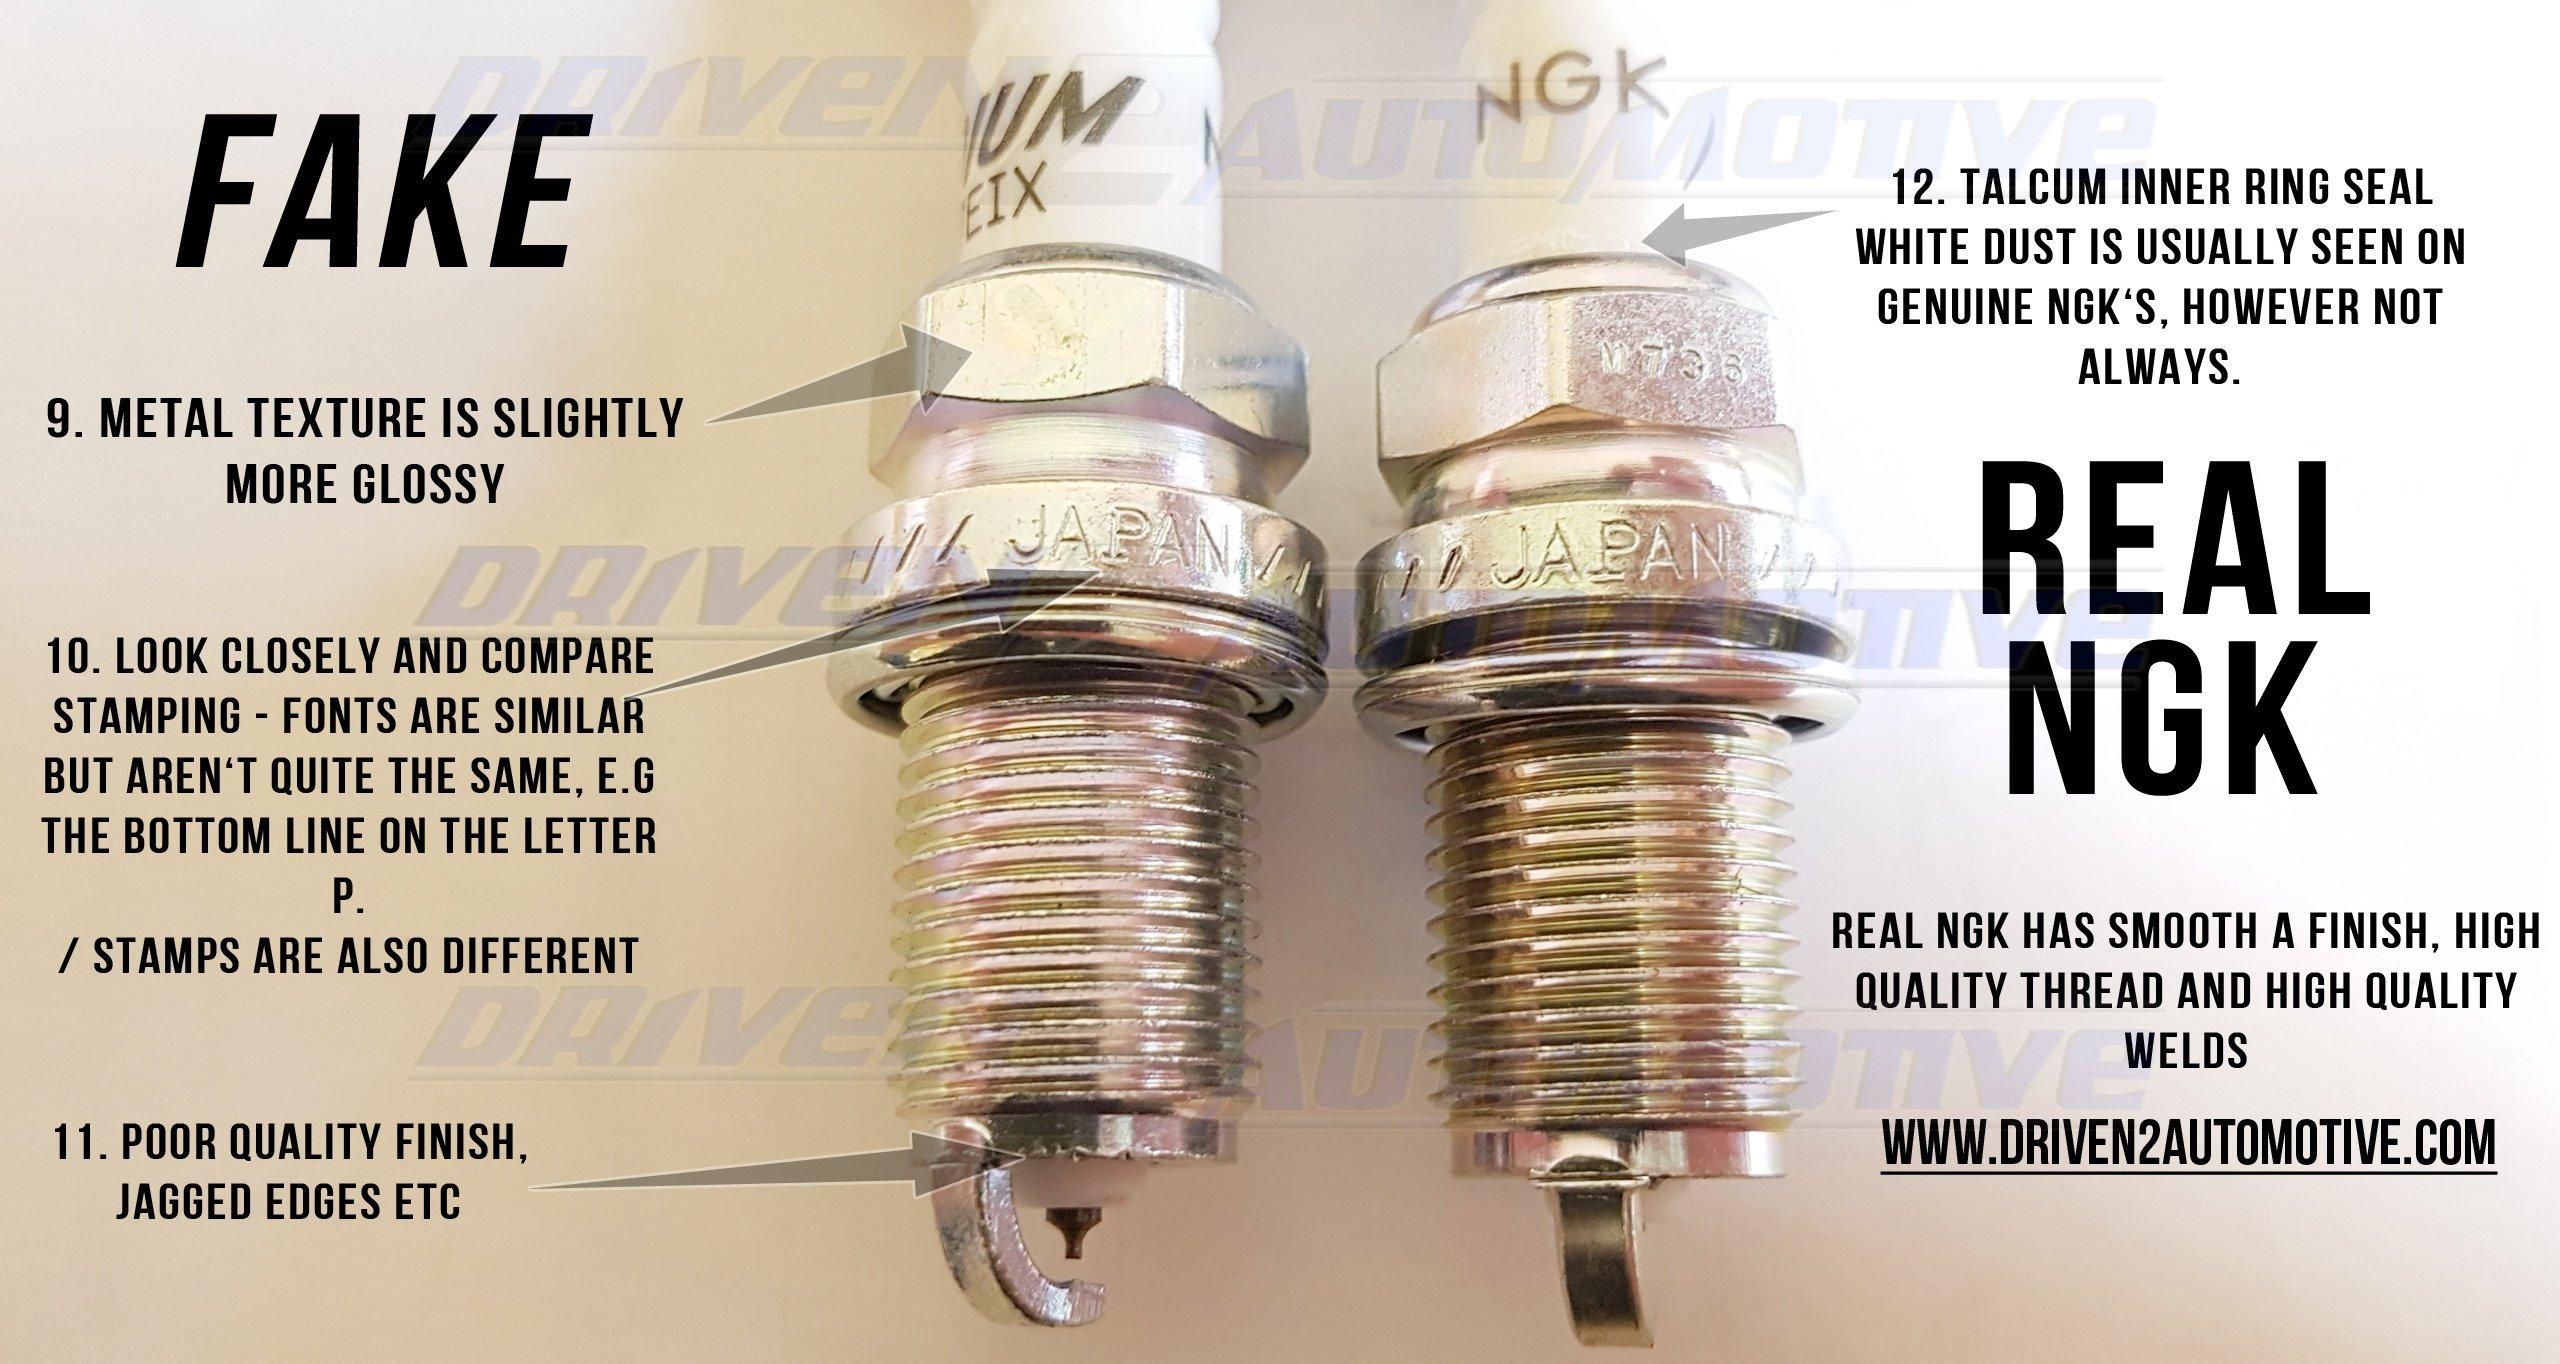 6 PCS NGK 6418 Iridium IX Spark Plugs BKR6EIX Made in JAPAN Parts & Accessories Ignition Systems SET OF 6 PLUGS